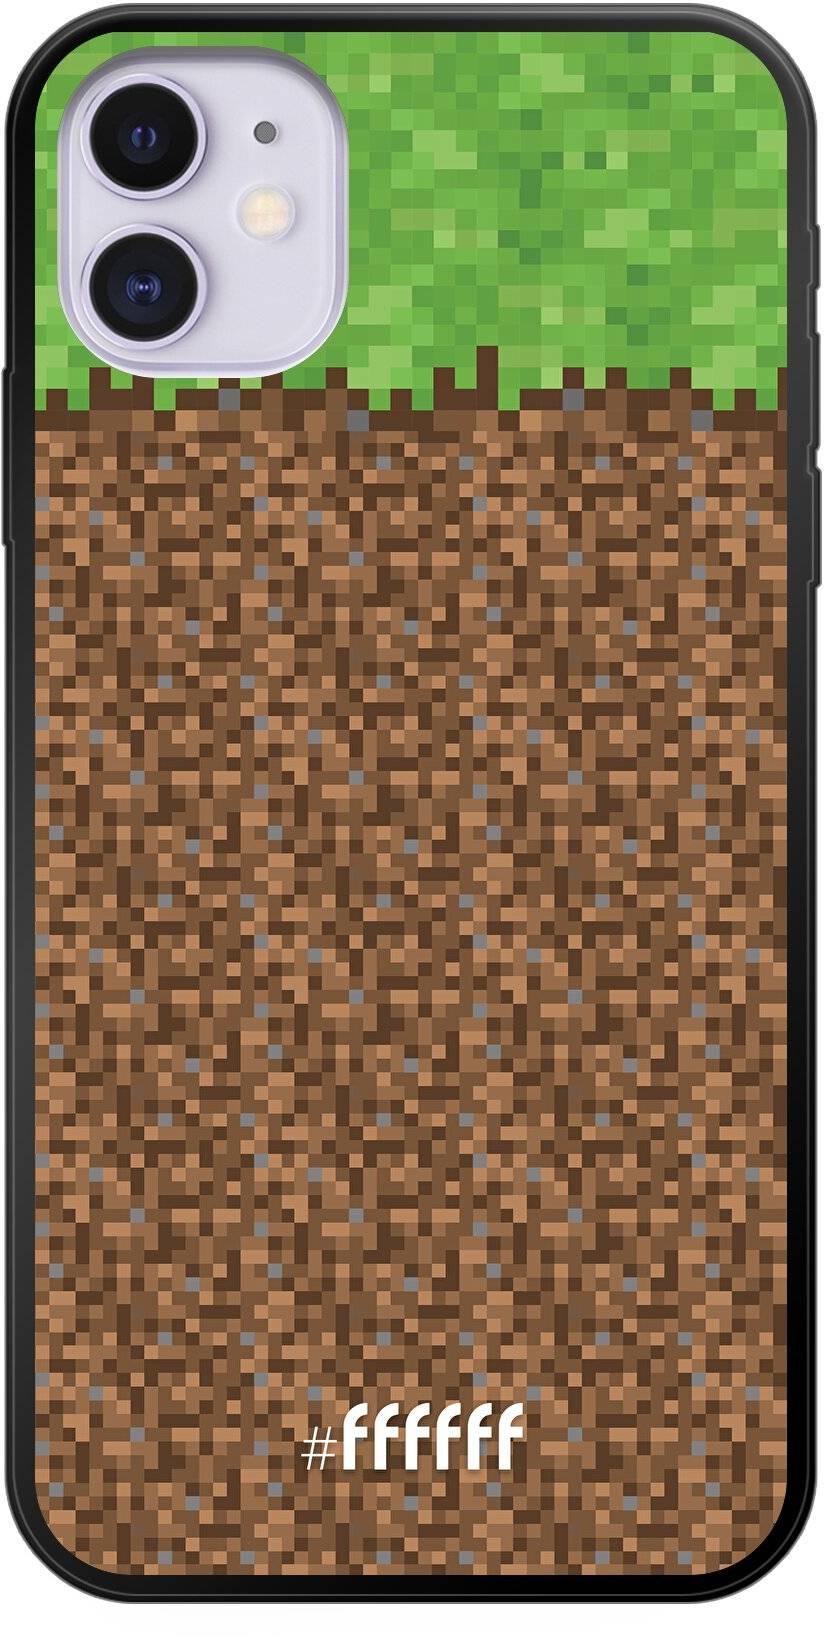 Minecraft - Grass iPhone 11